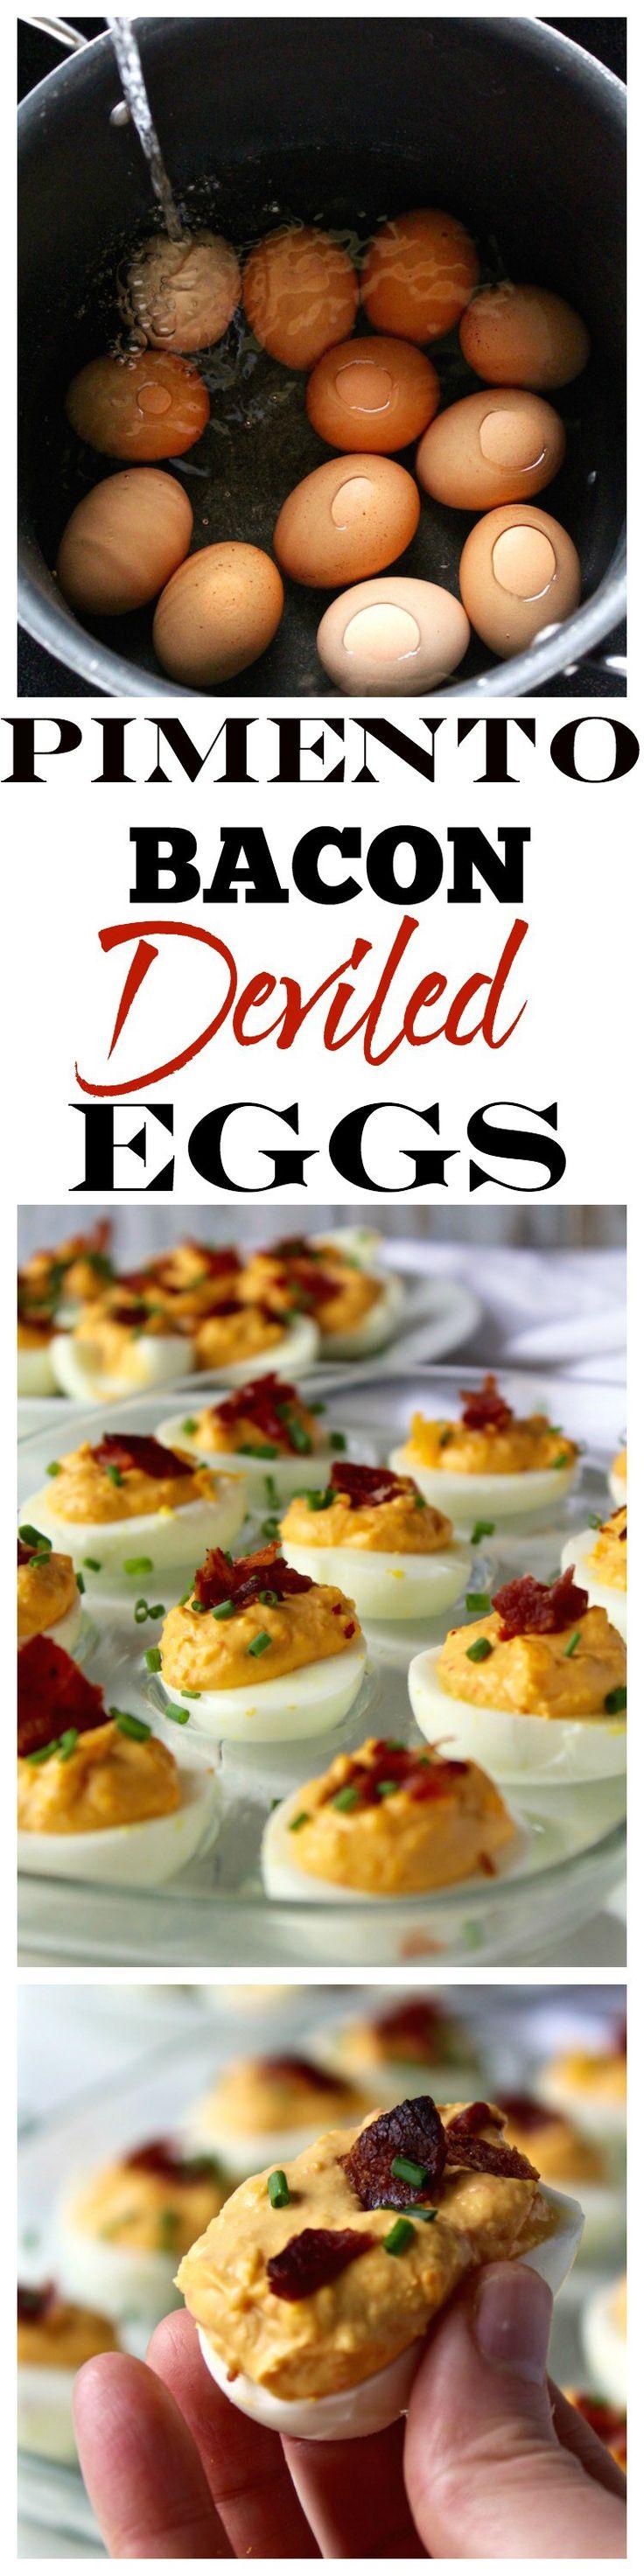 Pimento Bacon Deviled Eggs | Bessie Bakes